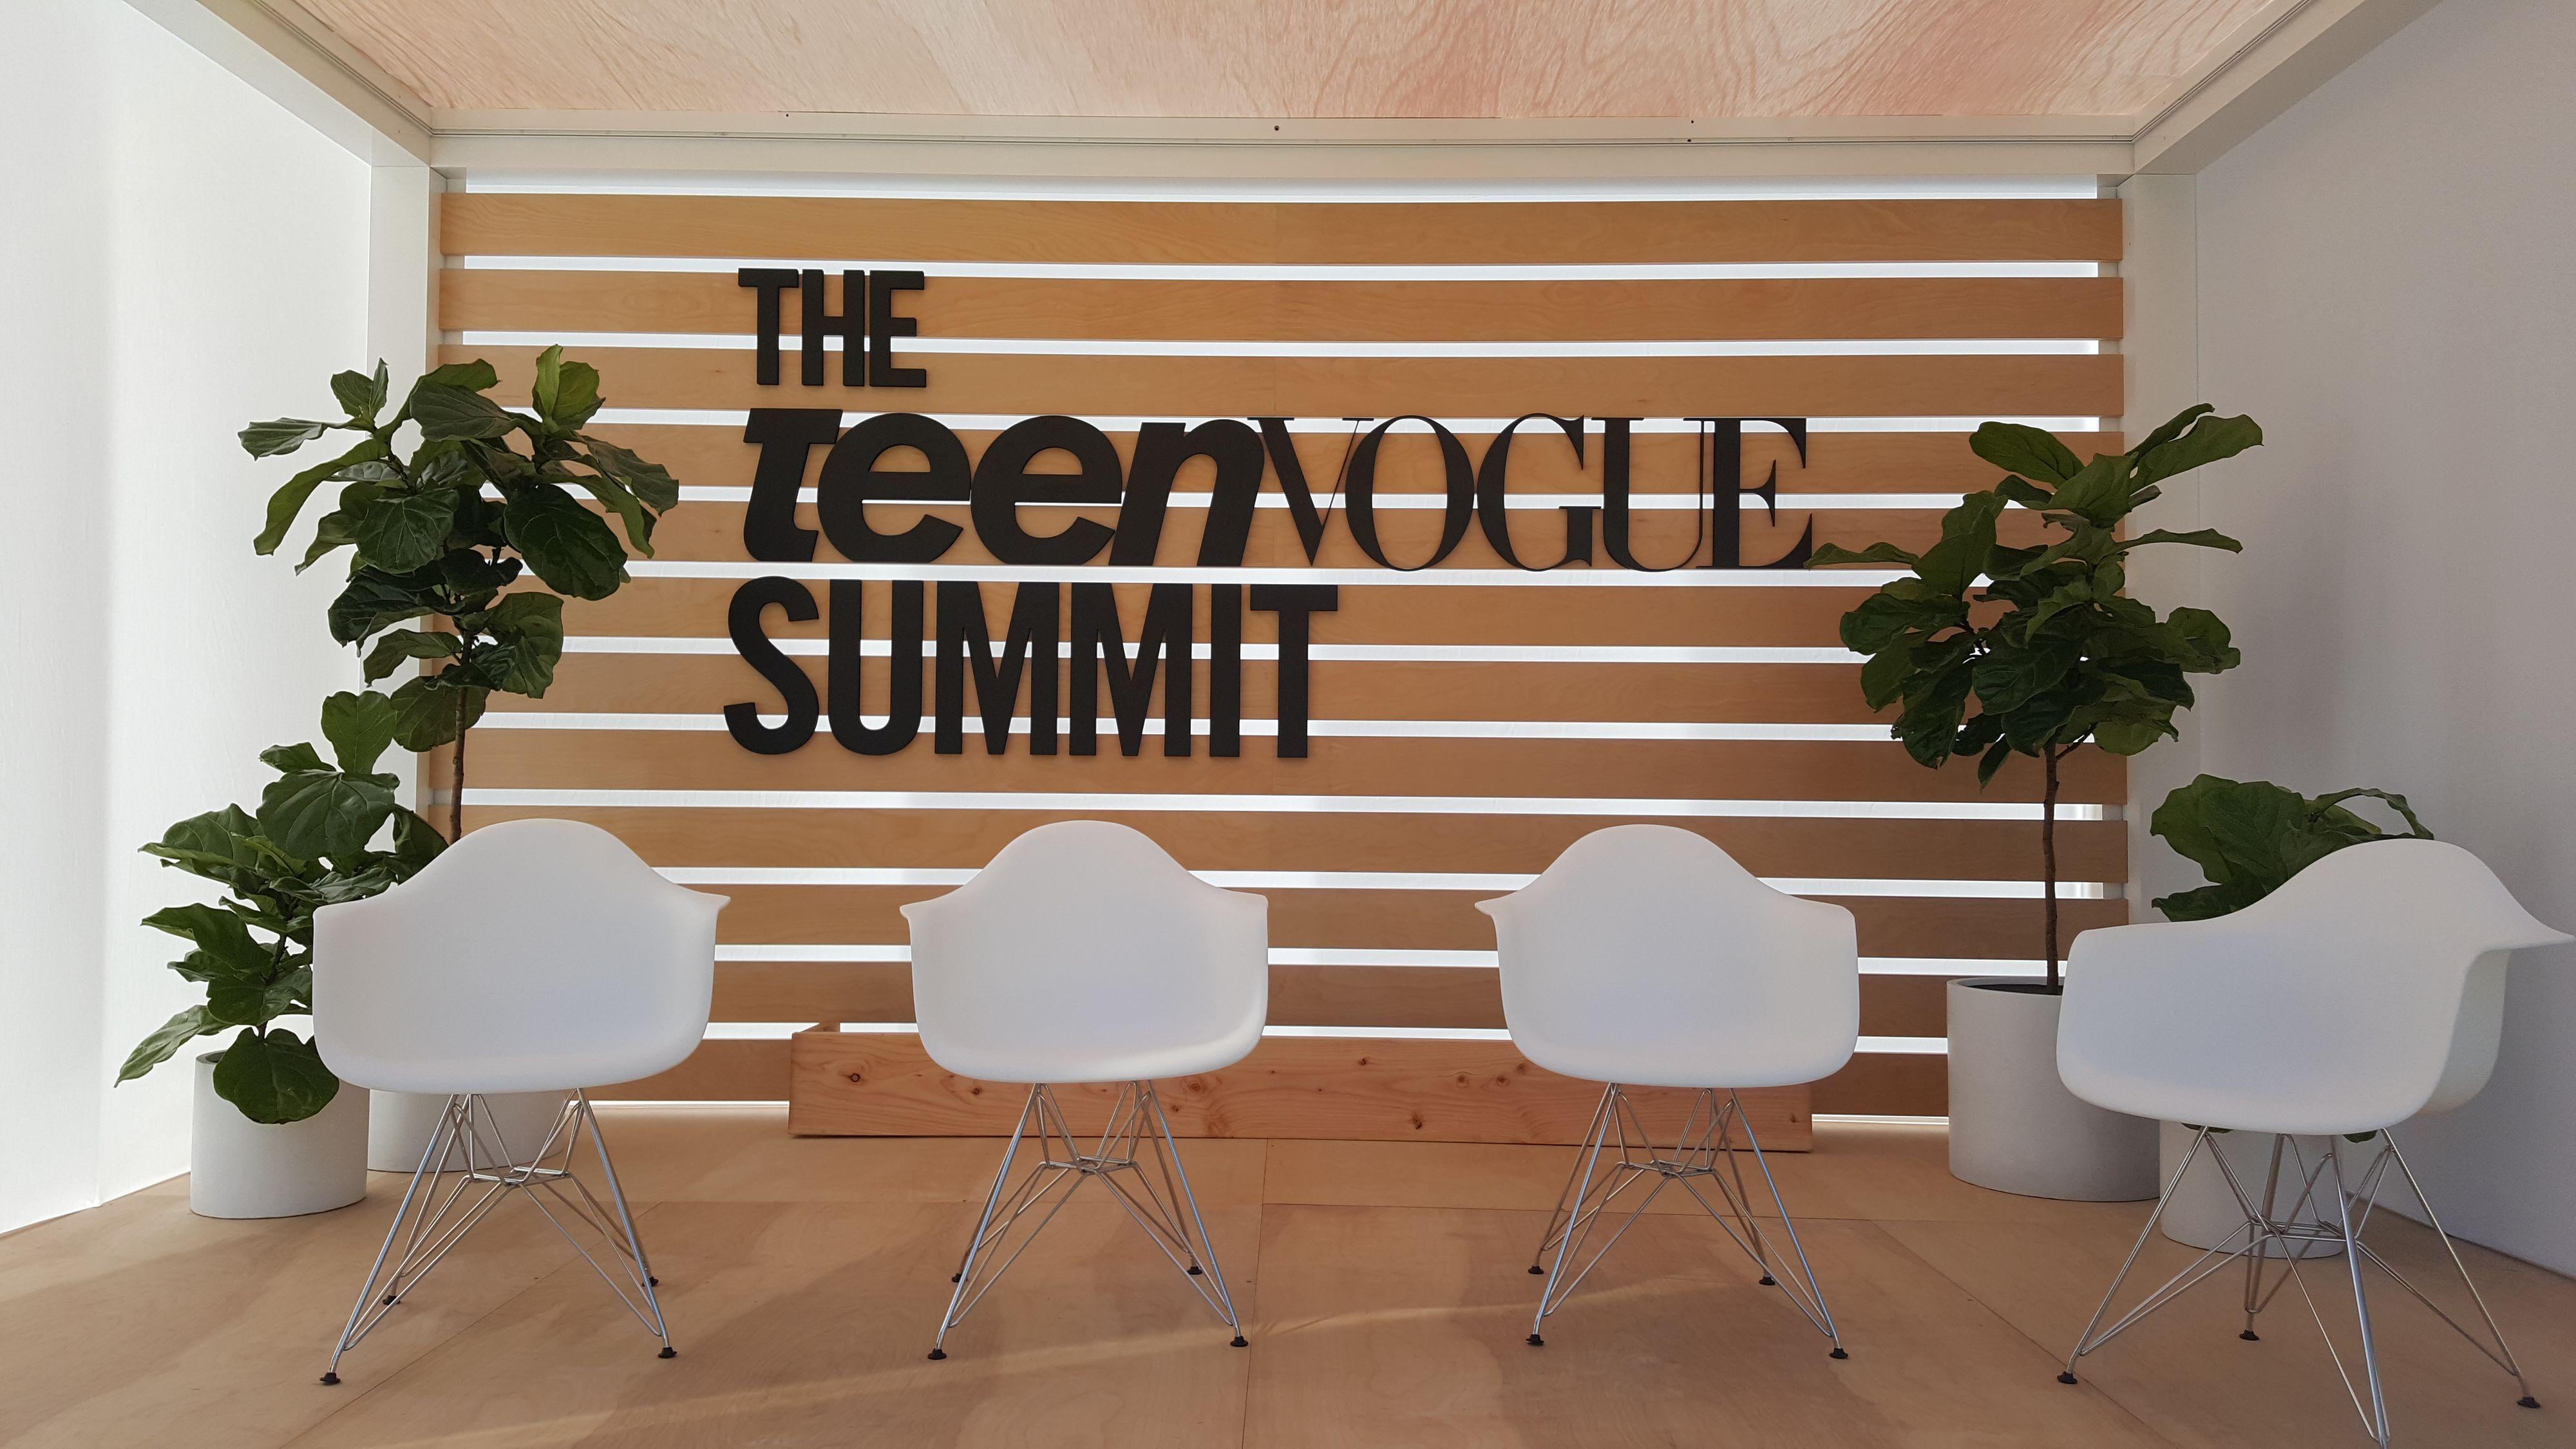 Teen Vogue Summit Scenic Design